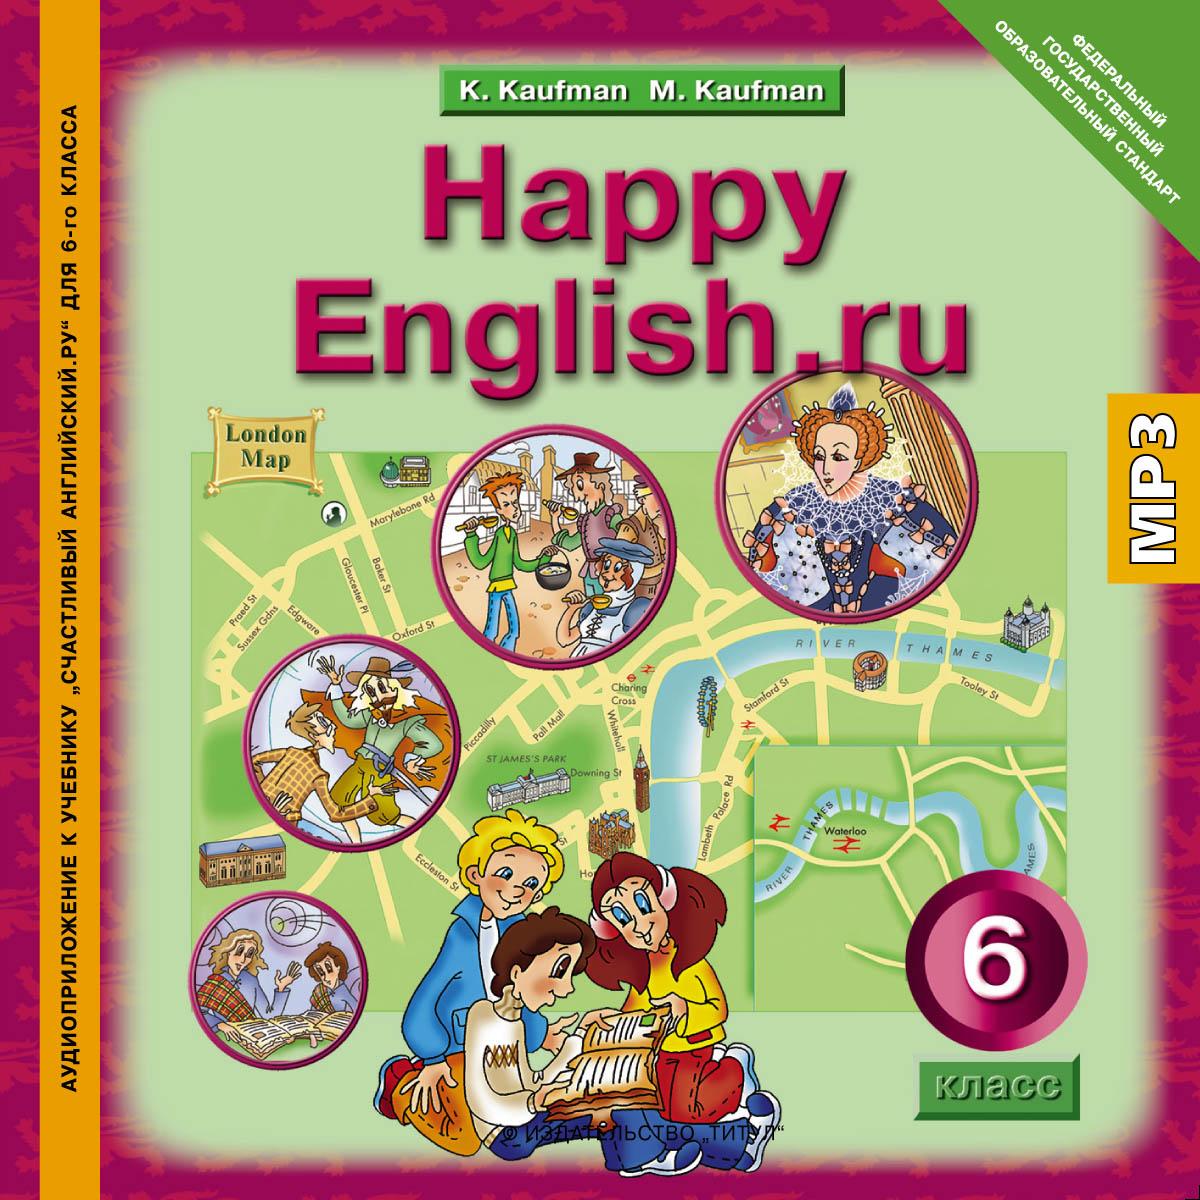 Happy English. ru: 6 /Английский язык. Счастливый английский. ру. 6 класс (аудиокурс MP3)